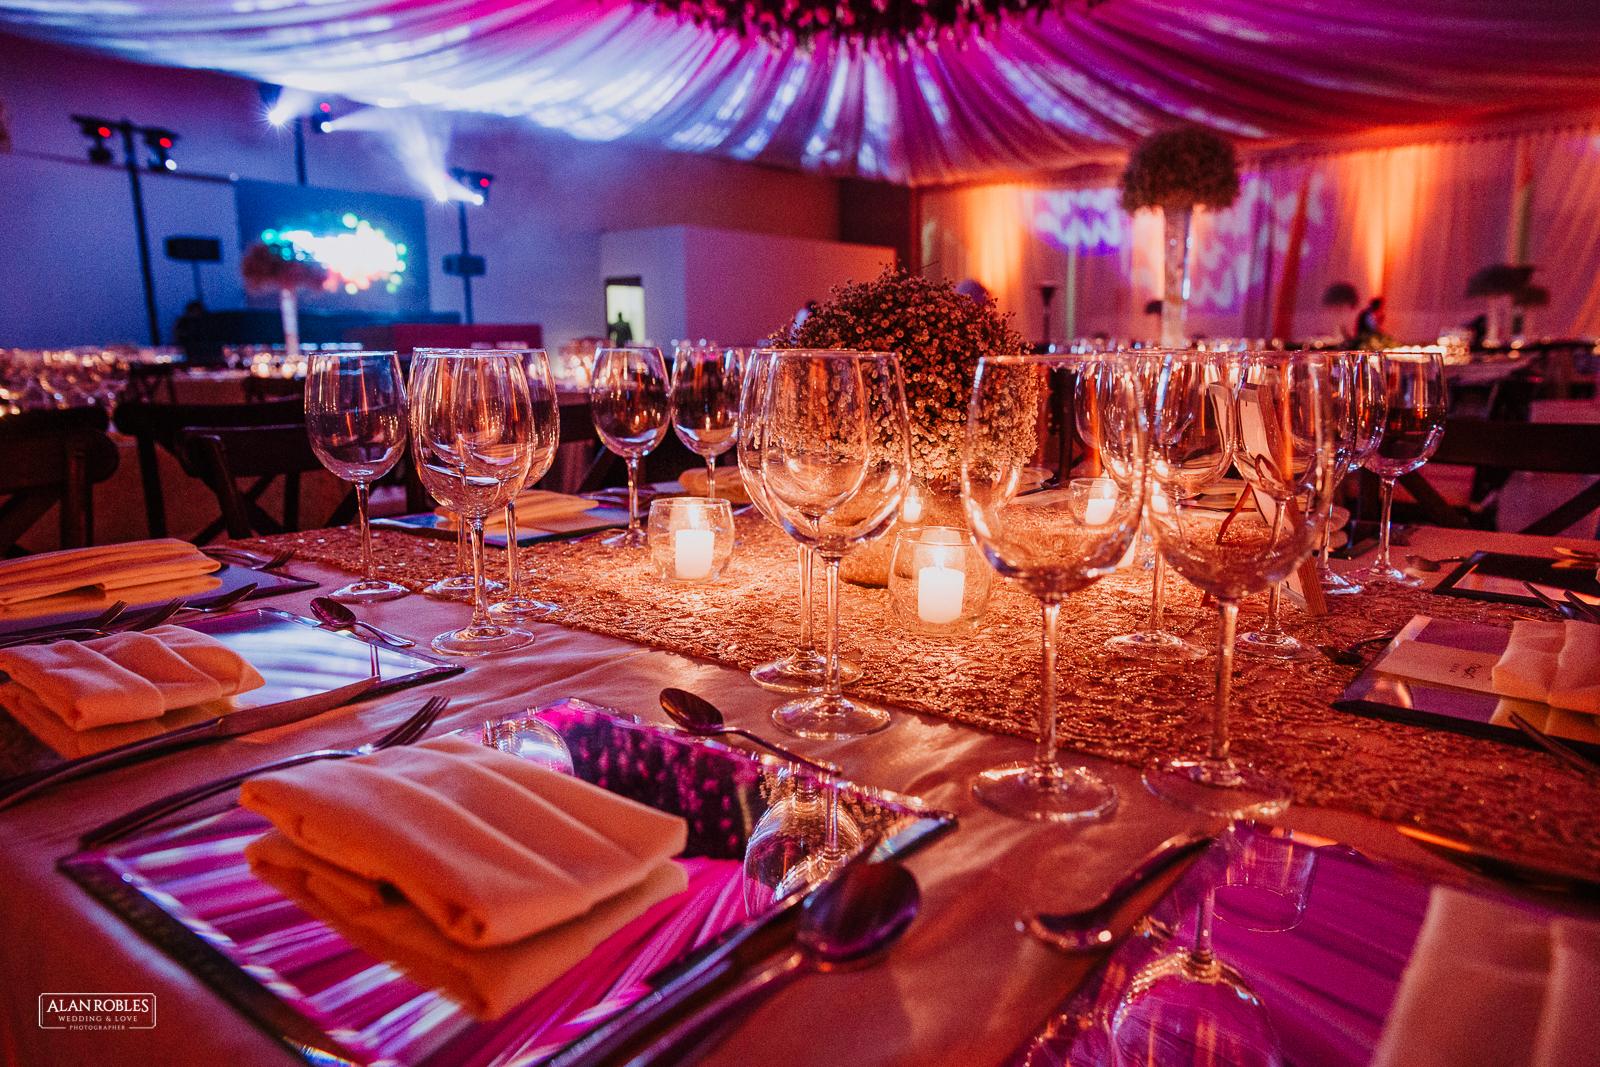 Fotografo de bodas Alan Robles-Boda en Guadalajara Real San Javier-51